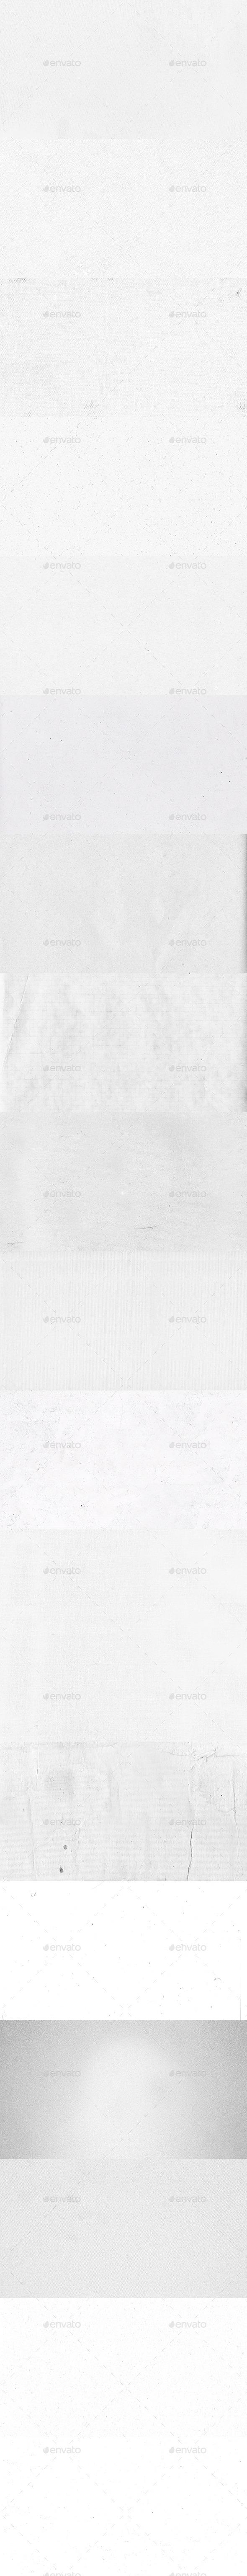 18 Paper Textures HD - Paper Textures